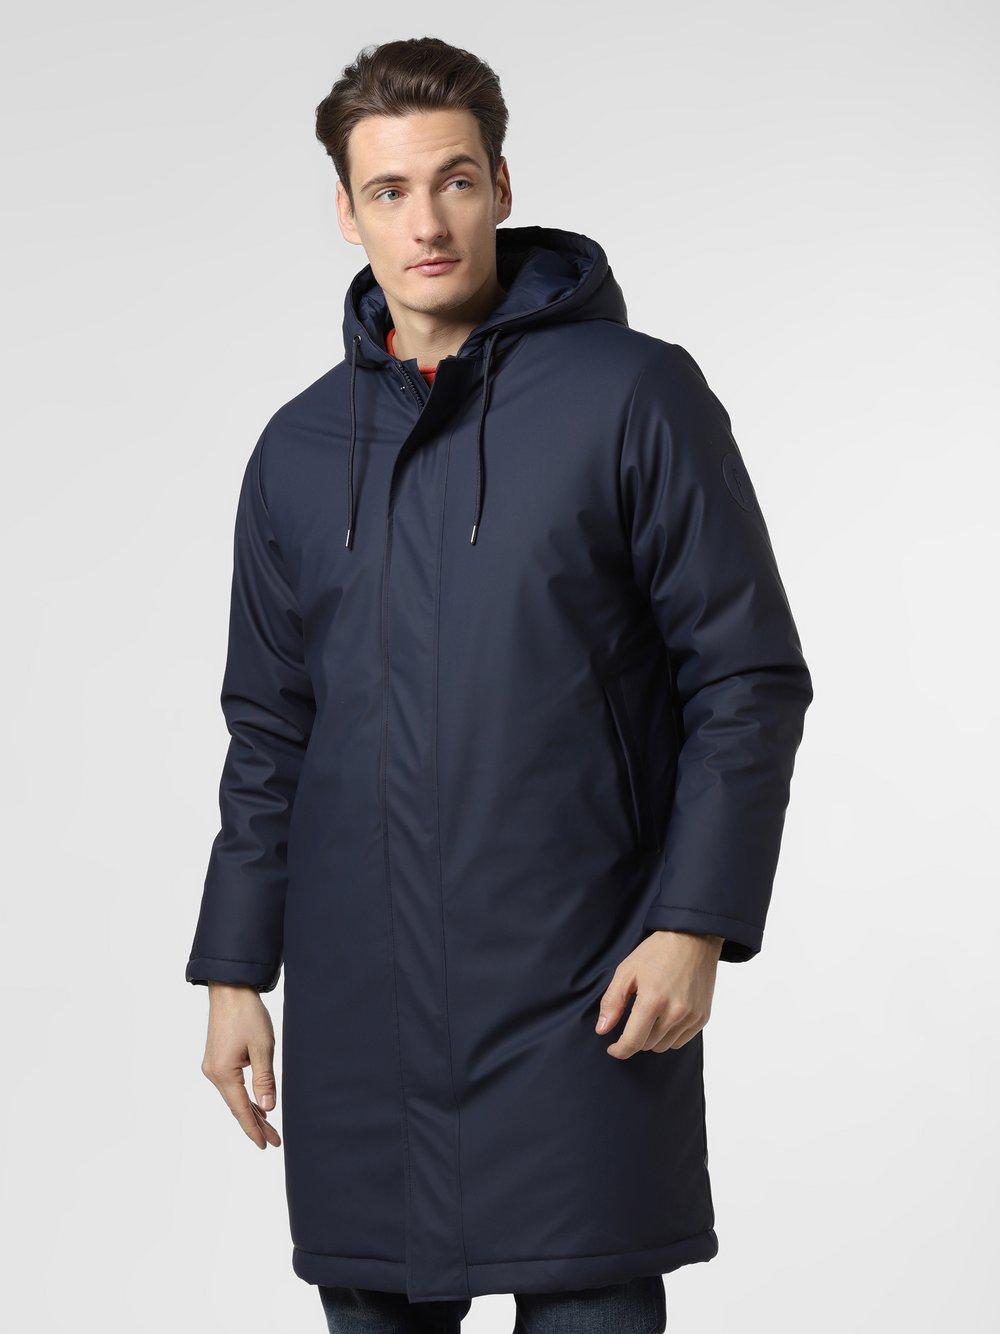 RAINS – Męska kurtka funkcyjna, niebieski Van Graaf 471654-0002-09960